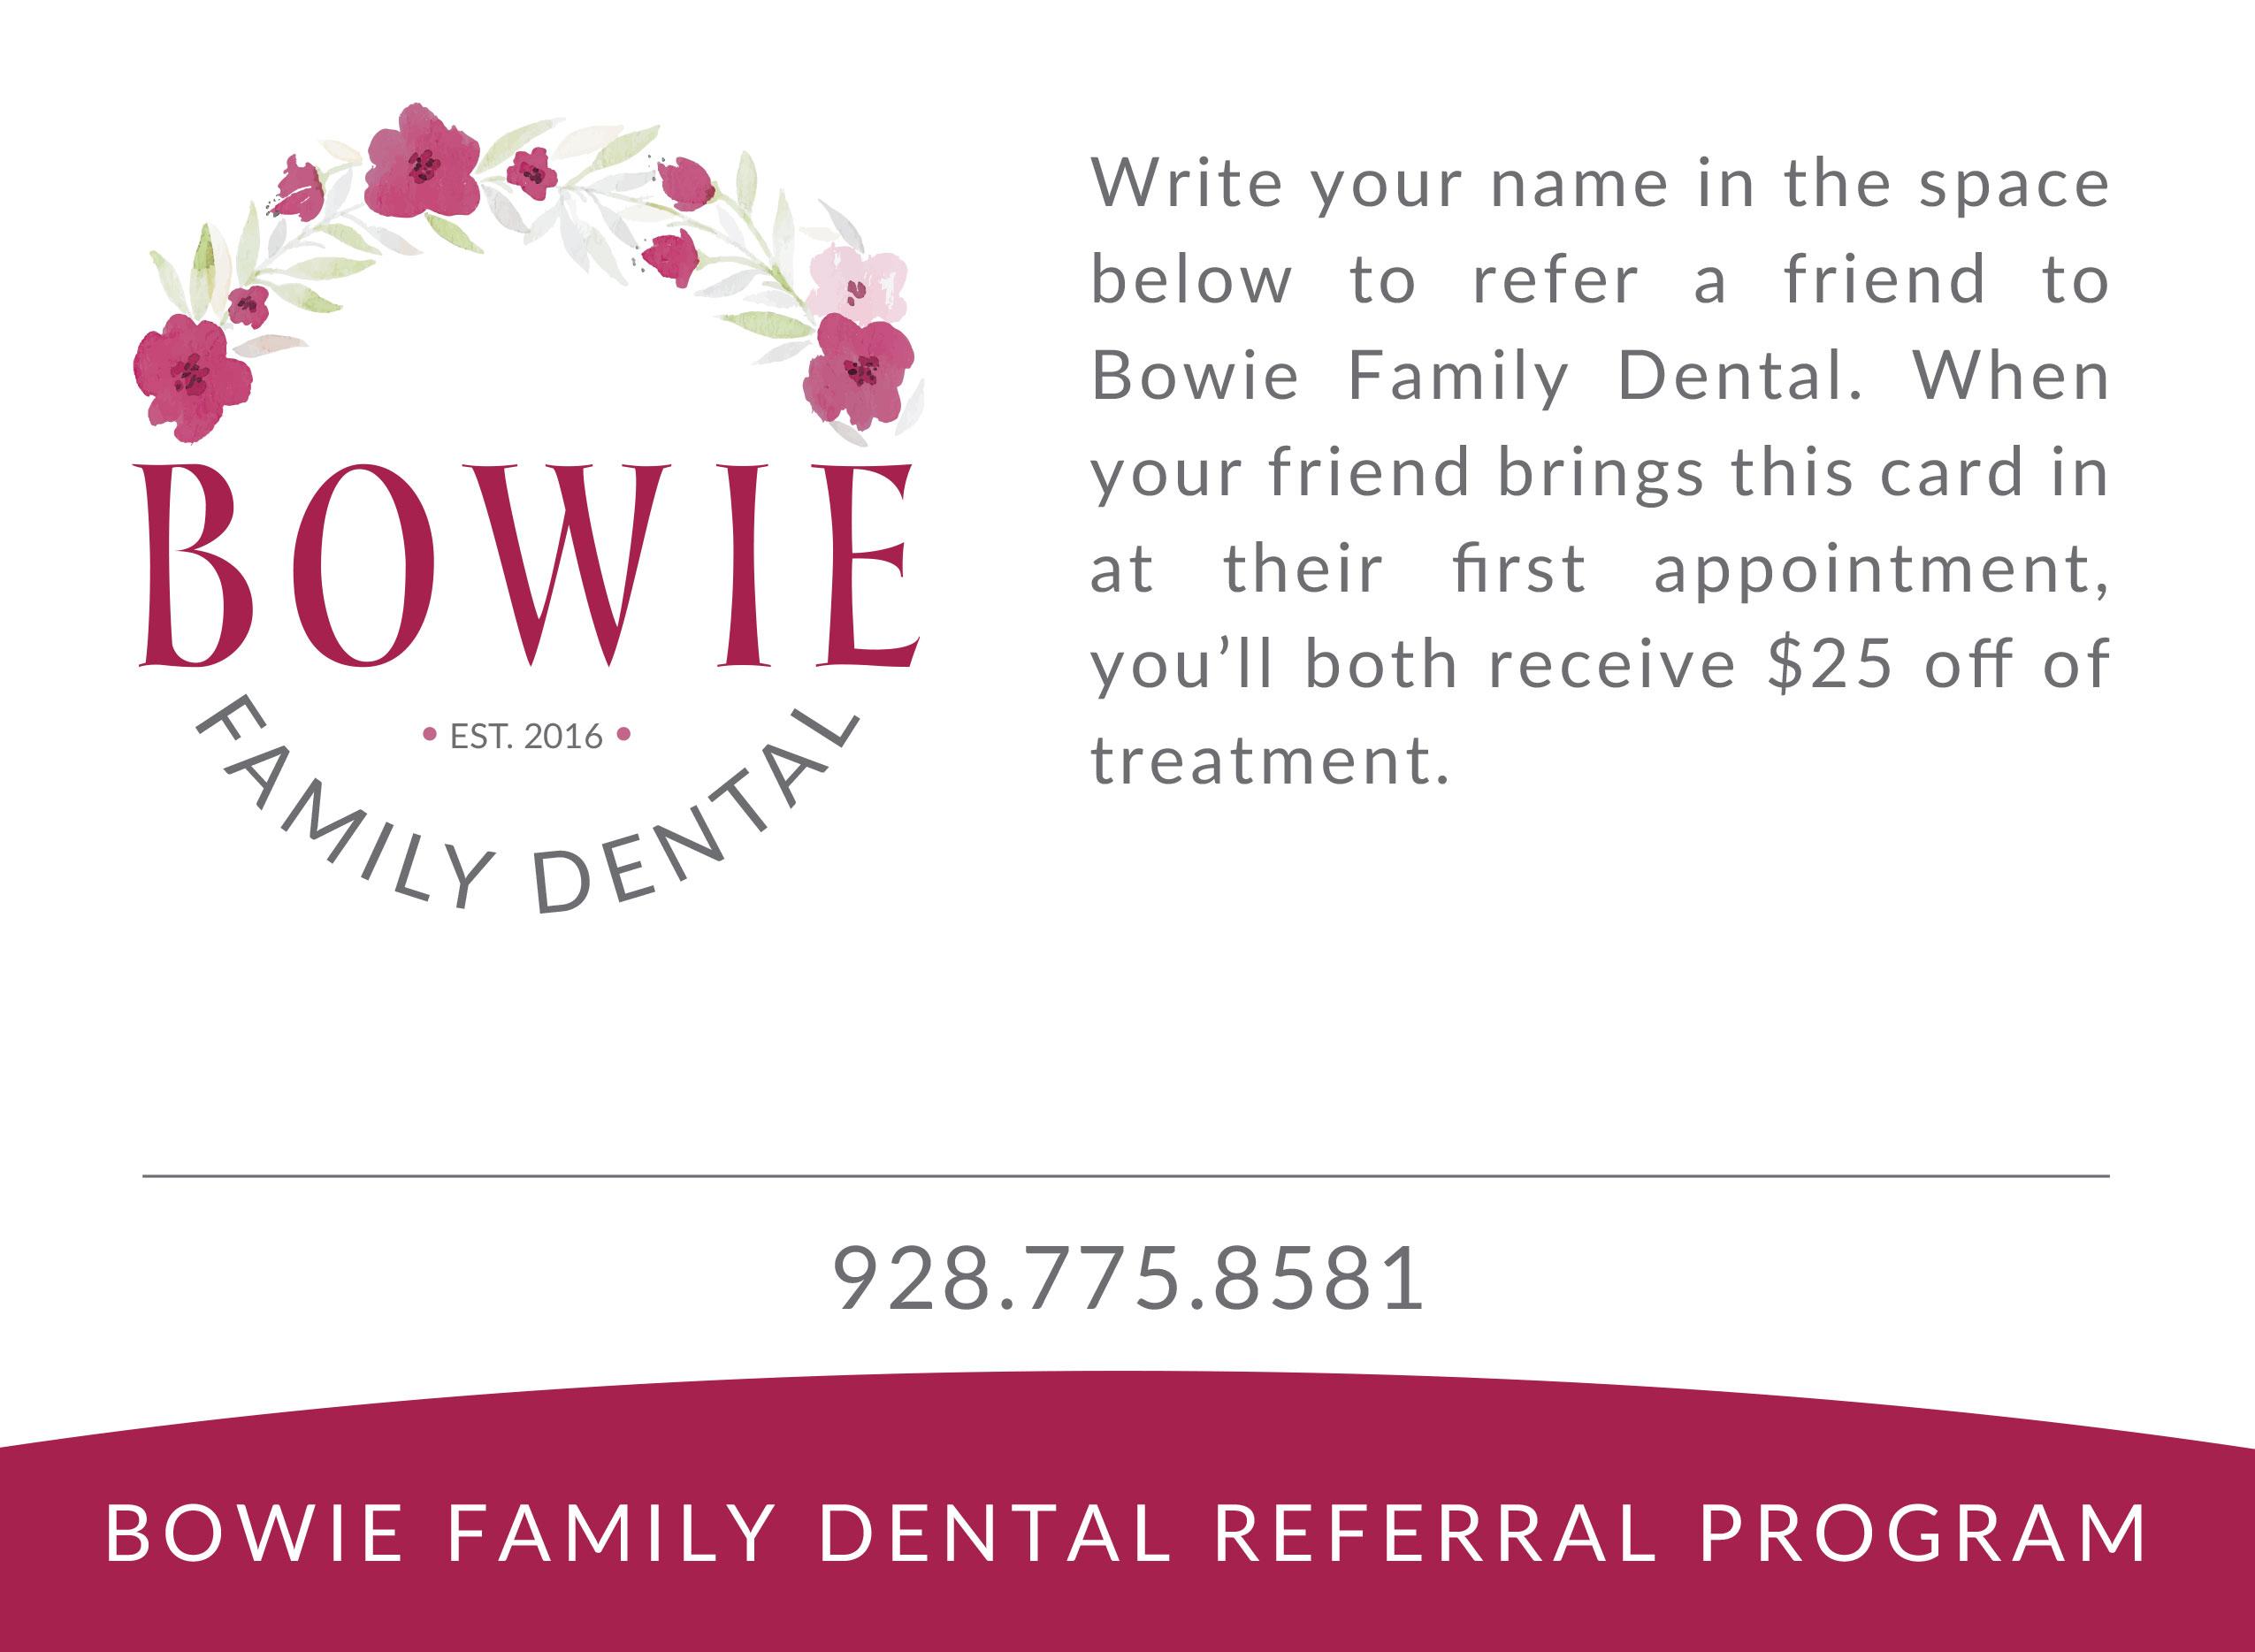 Bowie Family Dental Referral Program